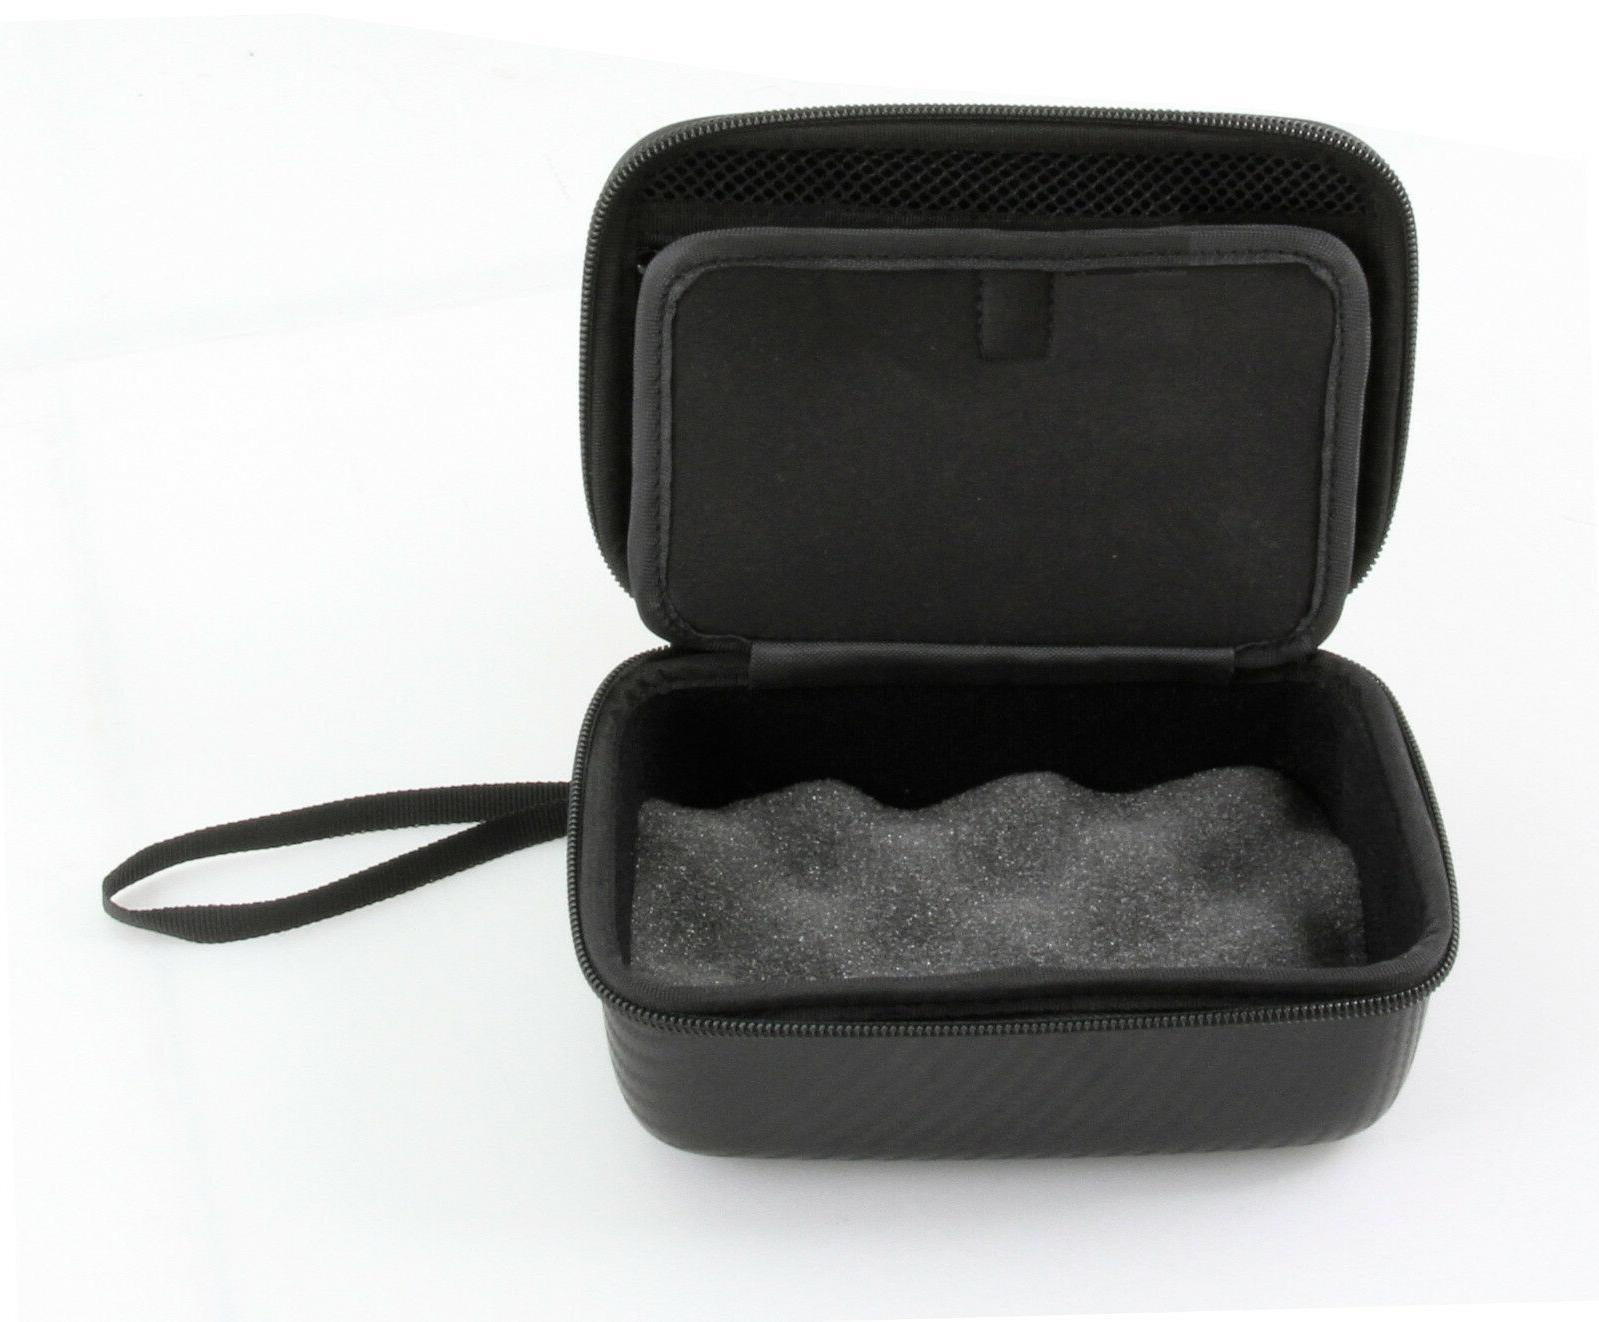 pico projector case fits artlii